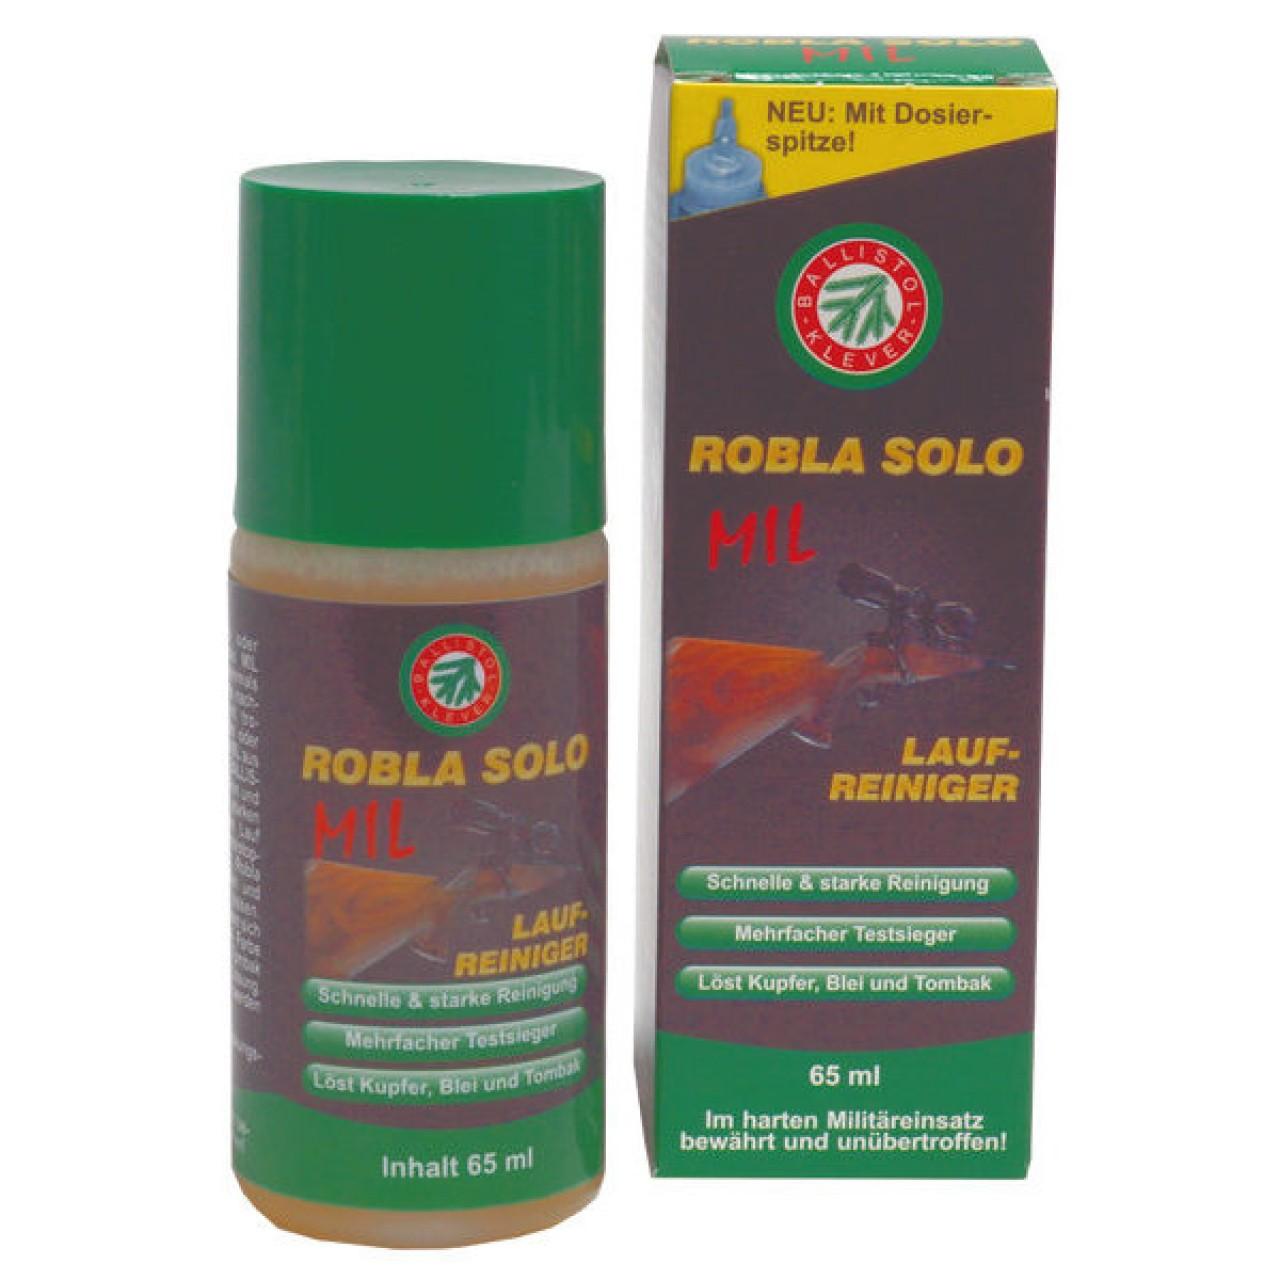 Ballistol Robla Solo MIL 65 ml